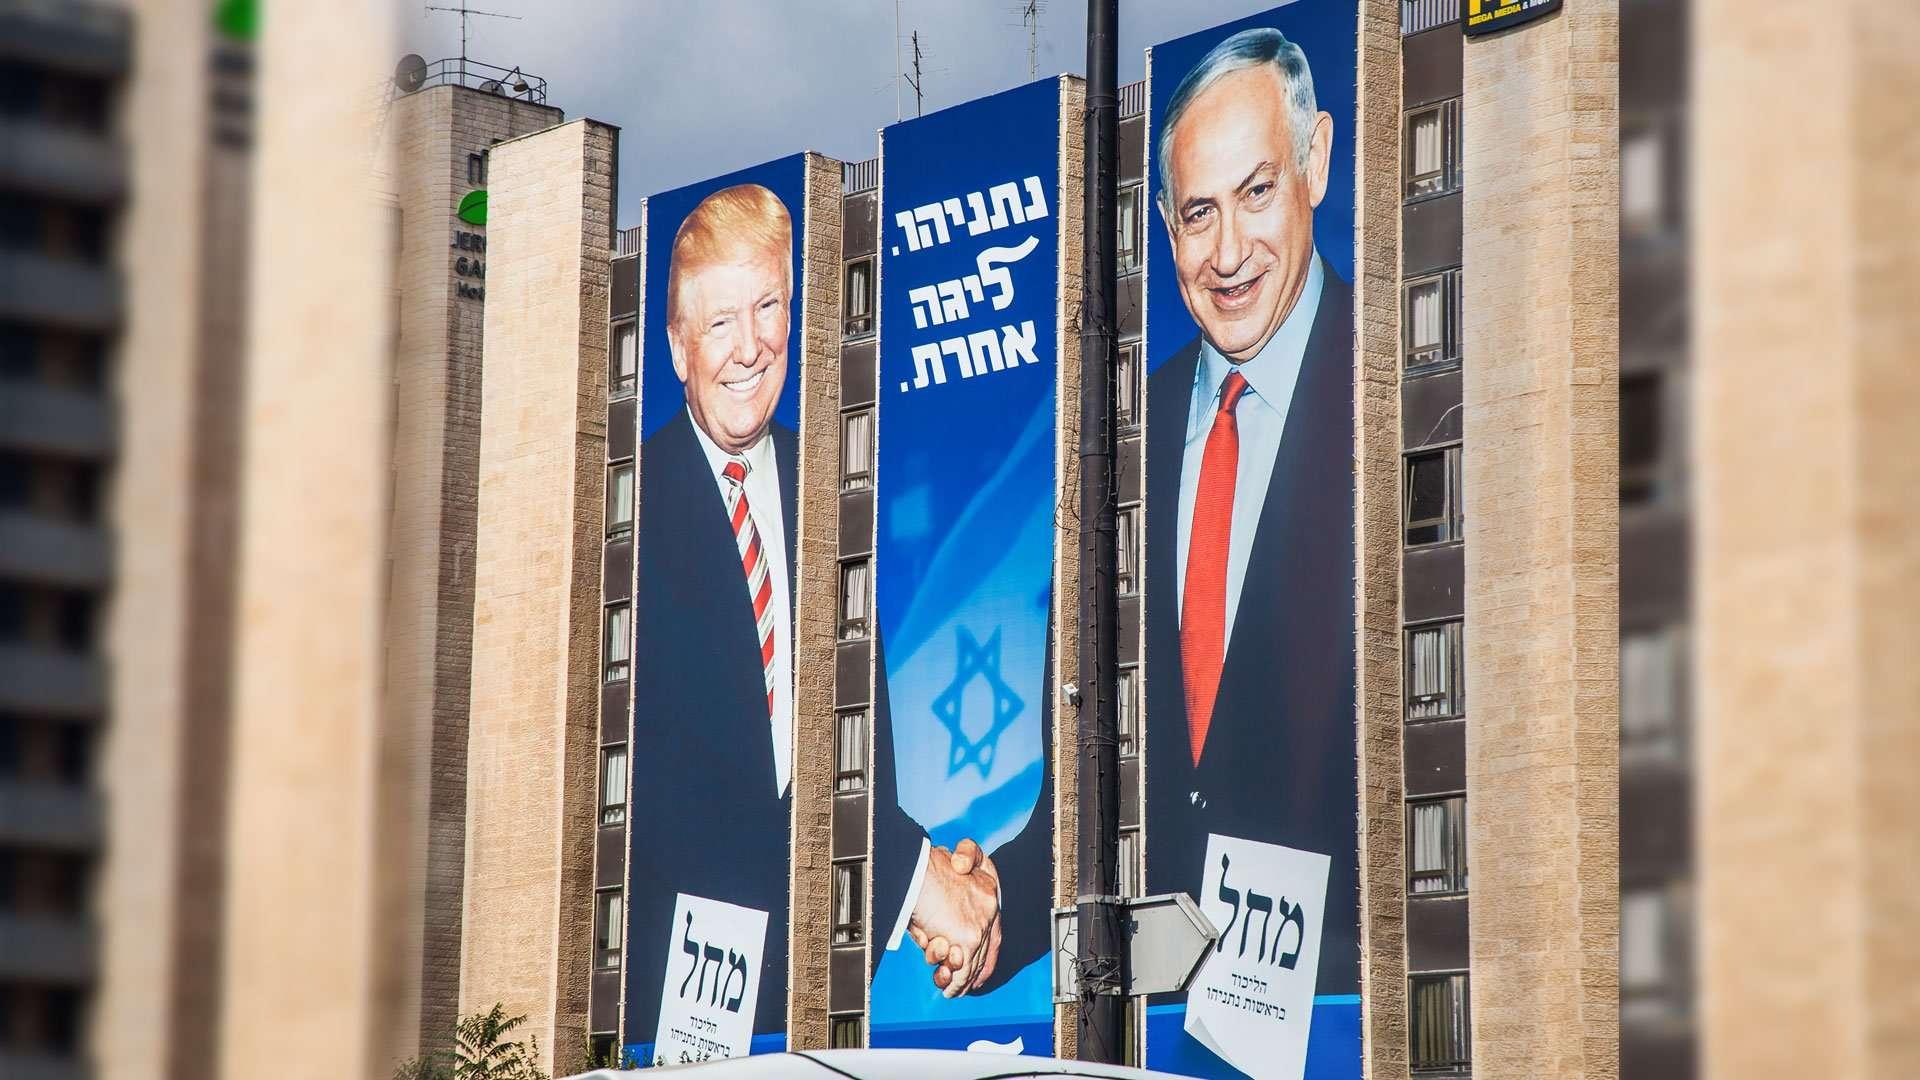 Billboard showing Netanyahu shake hands with Trump.